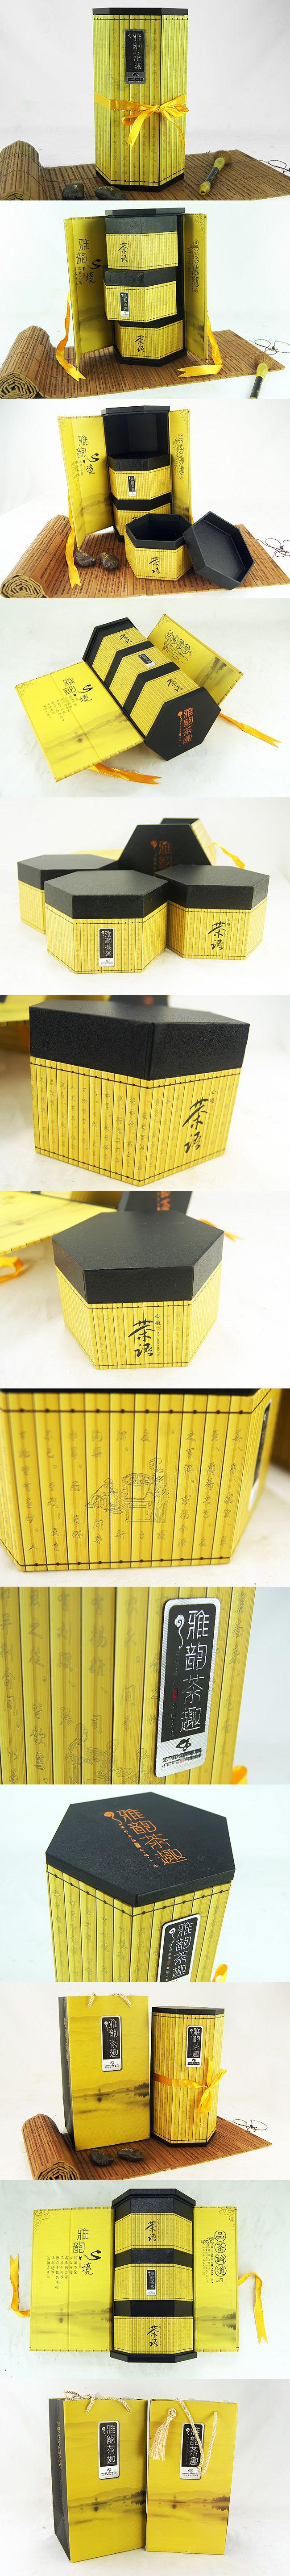 雅韵茶趣@糖水雪梨采集到包装(228图)_花瓣平面设计 This is quite beautiful #packaging. It says it's #tea PD